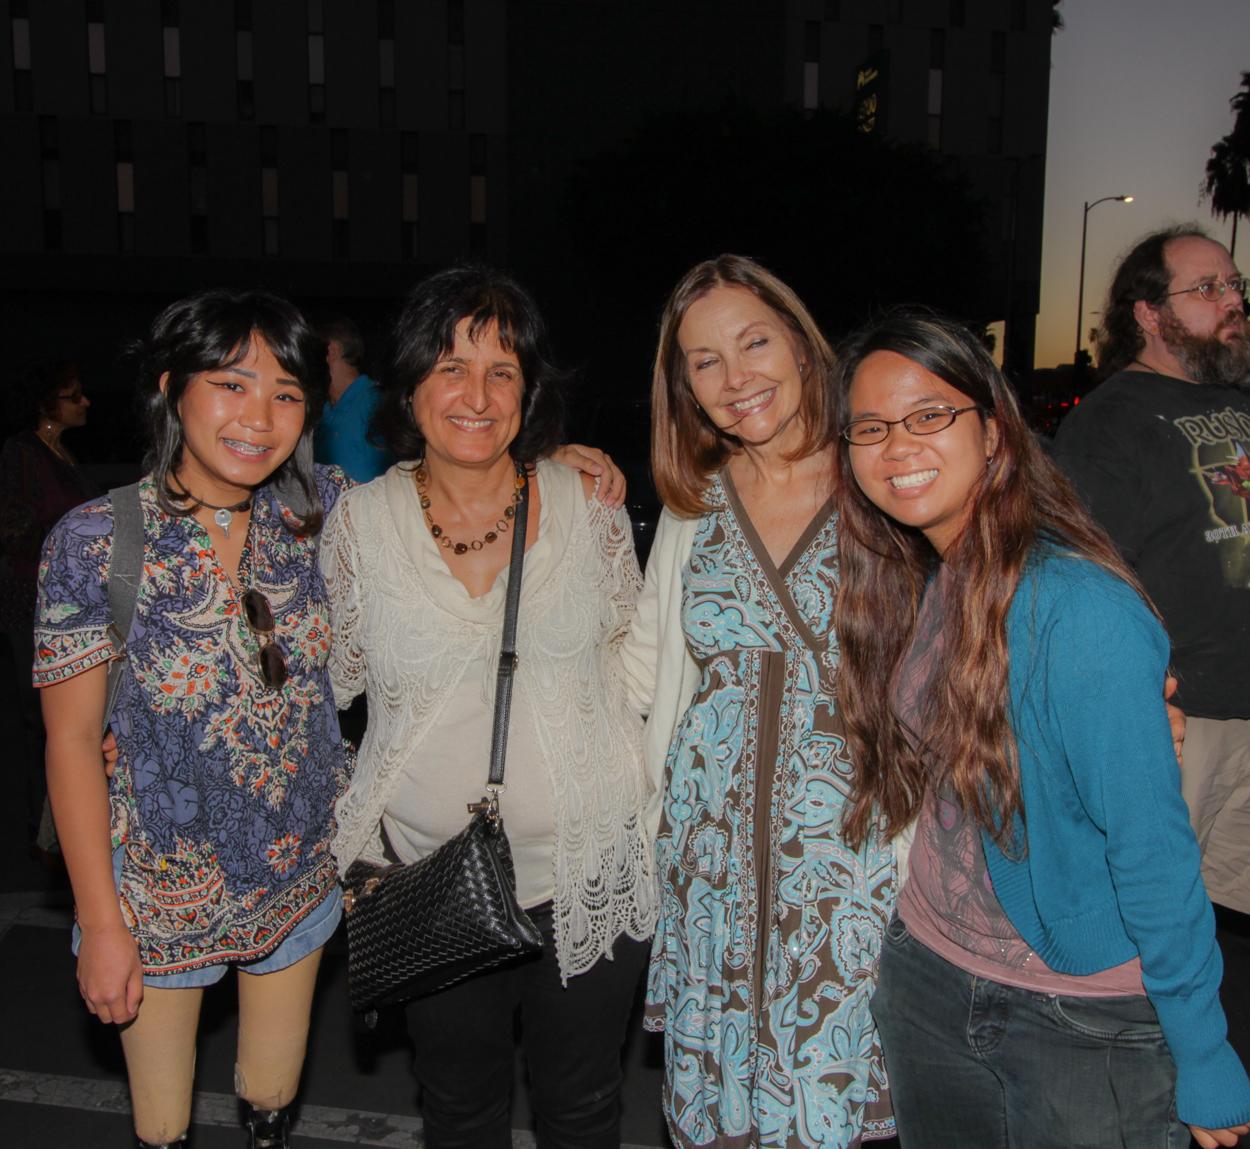 Uplifting Screening at Peace&Harmony Weekend